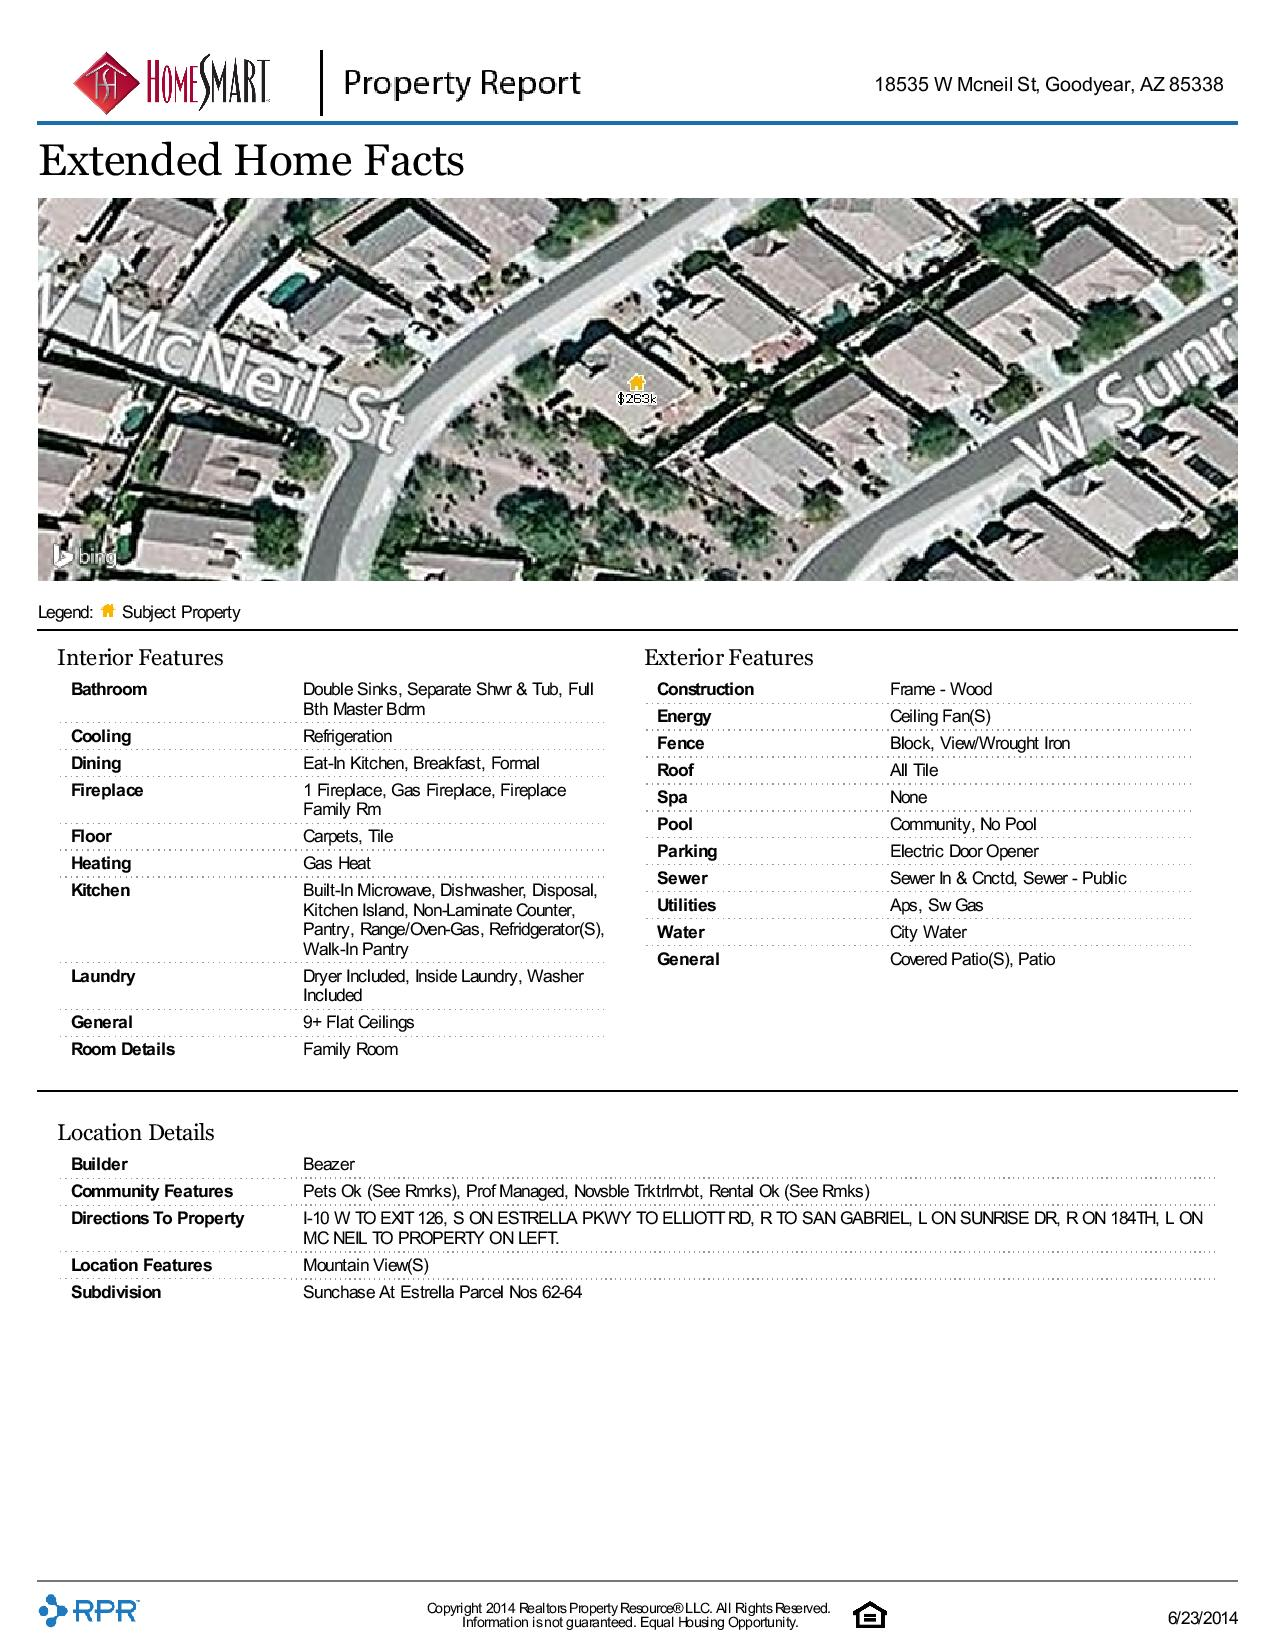 18535-W-Mcneil-St-Goodyear-AZ-85338-page-004